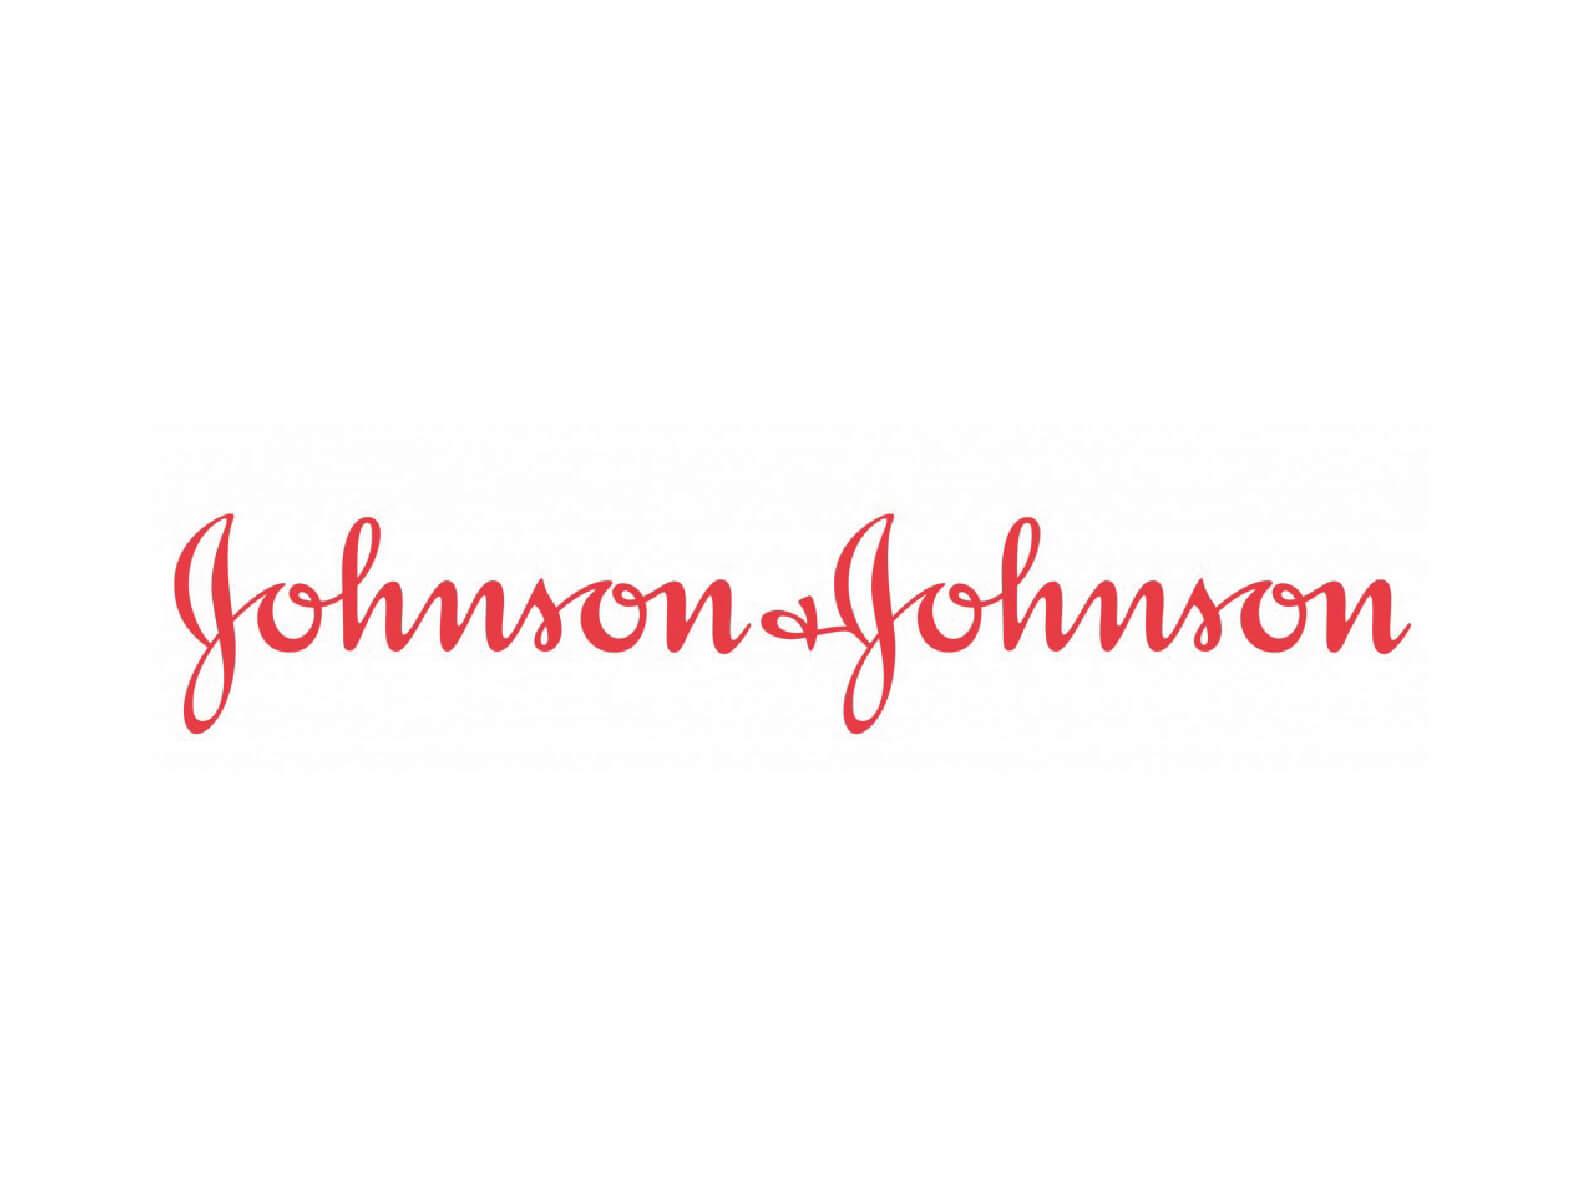 agence kayak communication web lille nord johnson & johnson logo